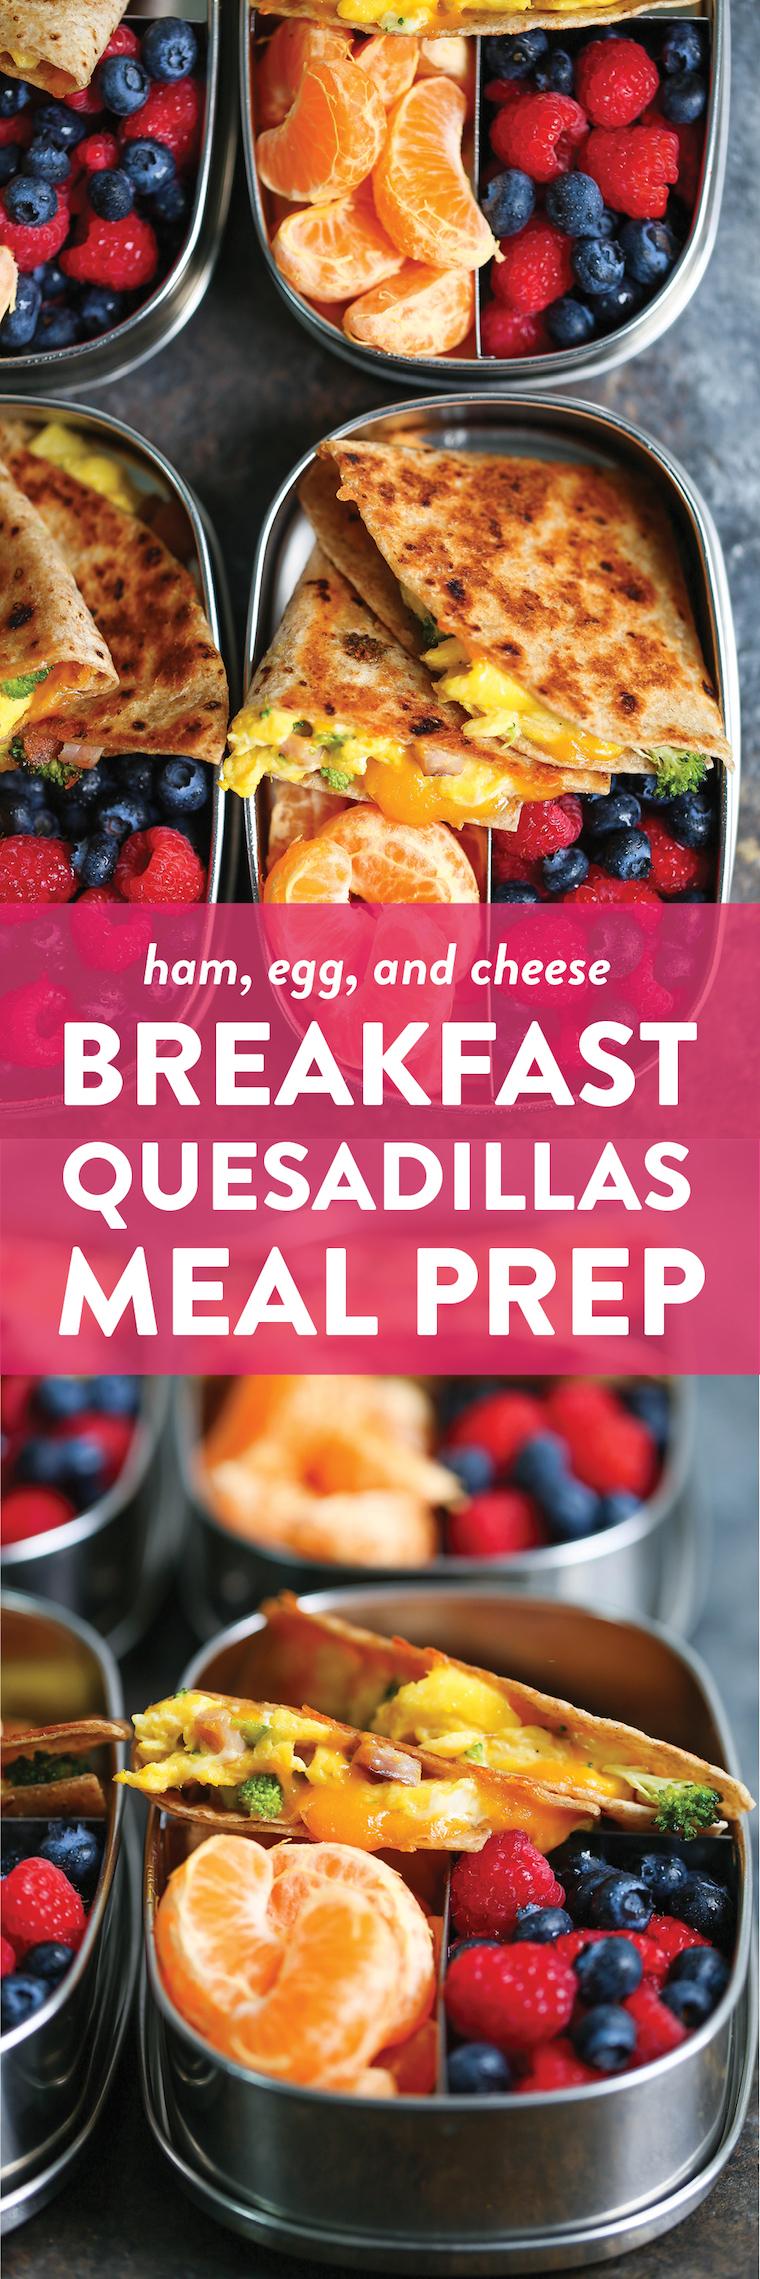 Breakfast Quesadillas Recipe